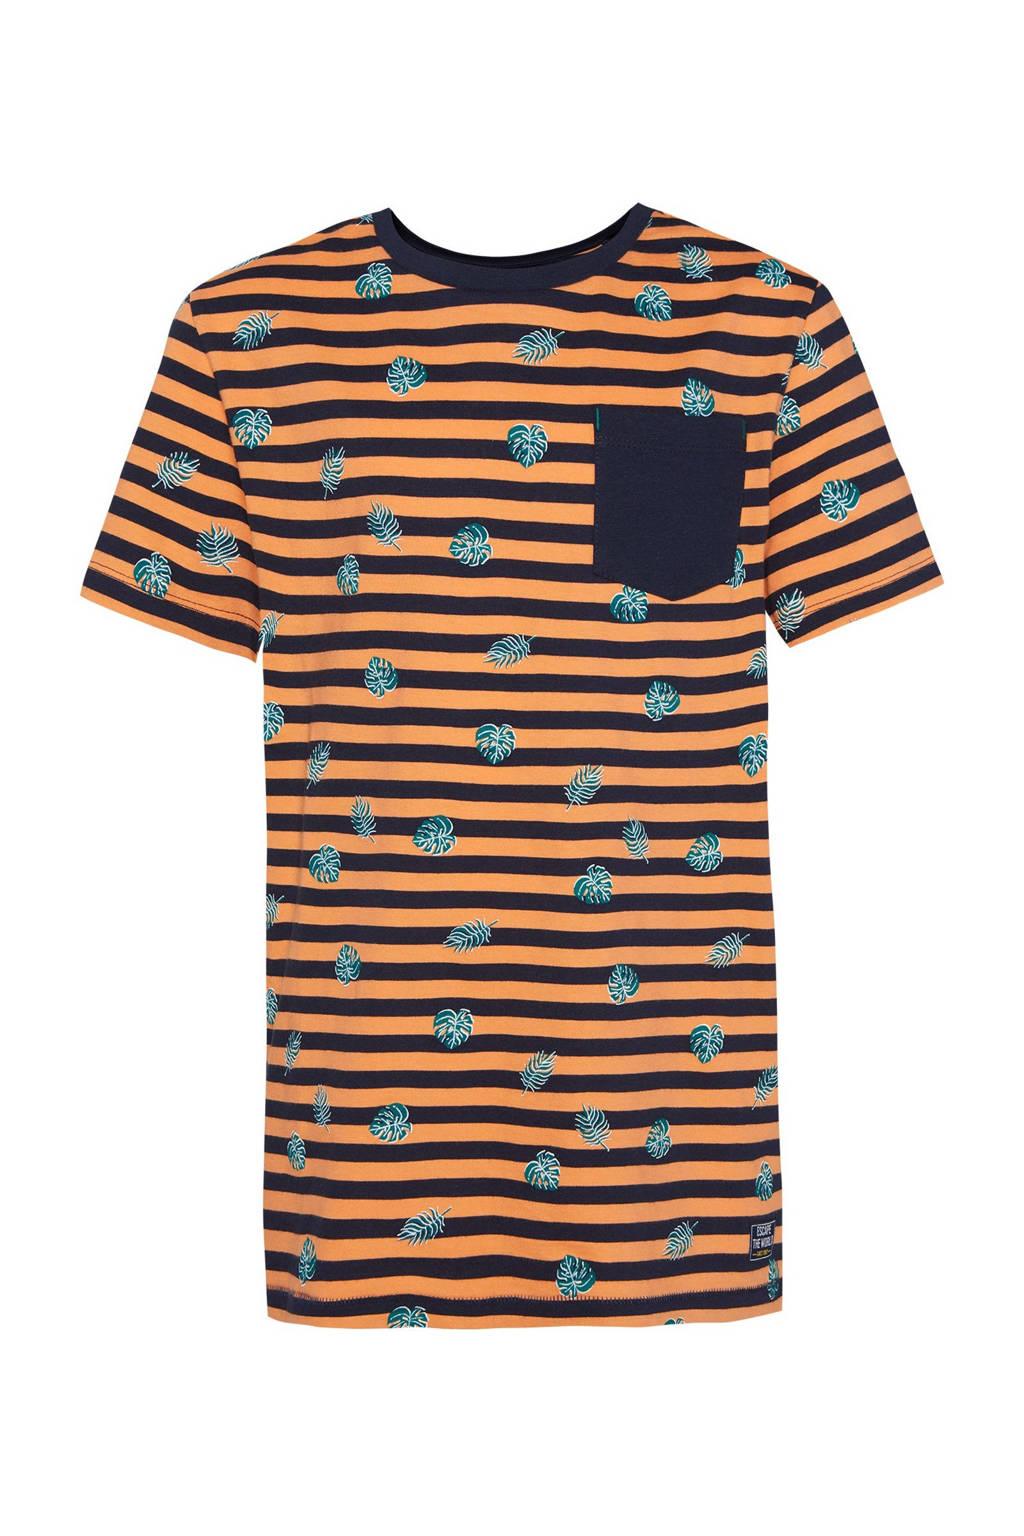 WE Fashion gestreept regular fit T-shirt oranje/donkerblauw/groen, Oranje/donkerblauw/groen